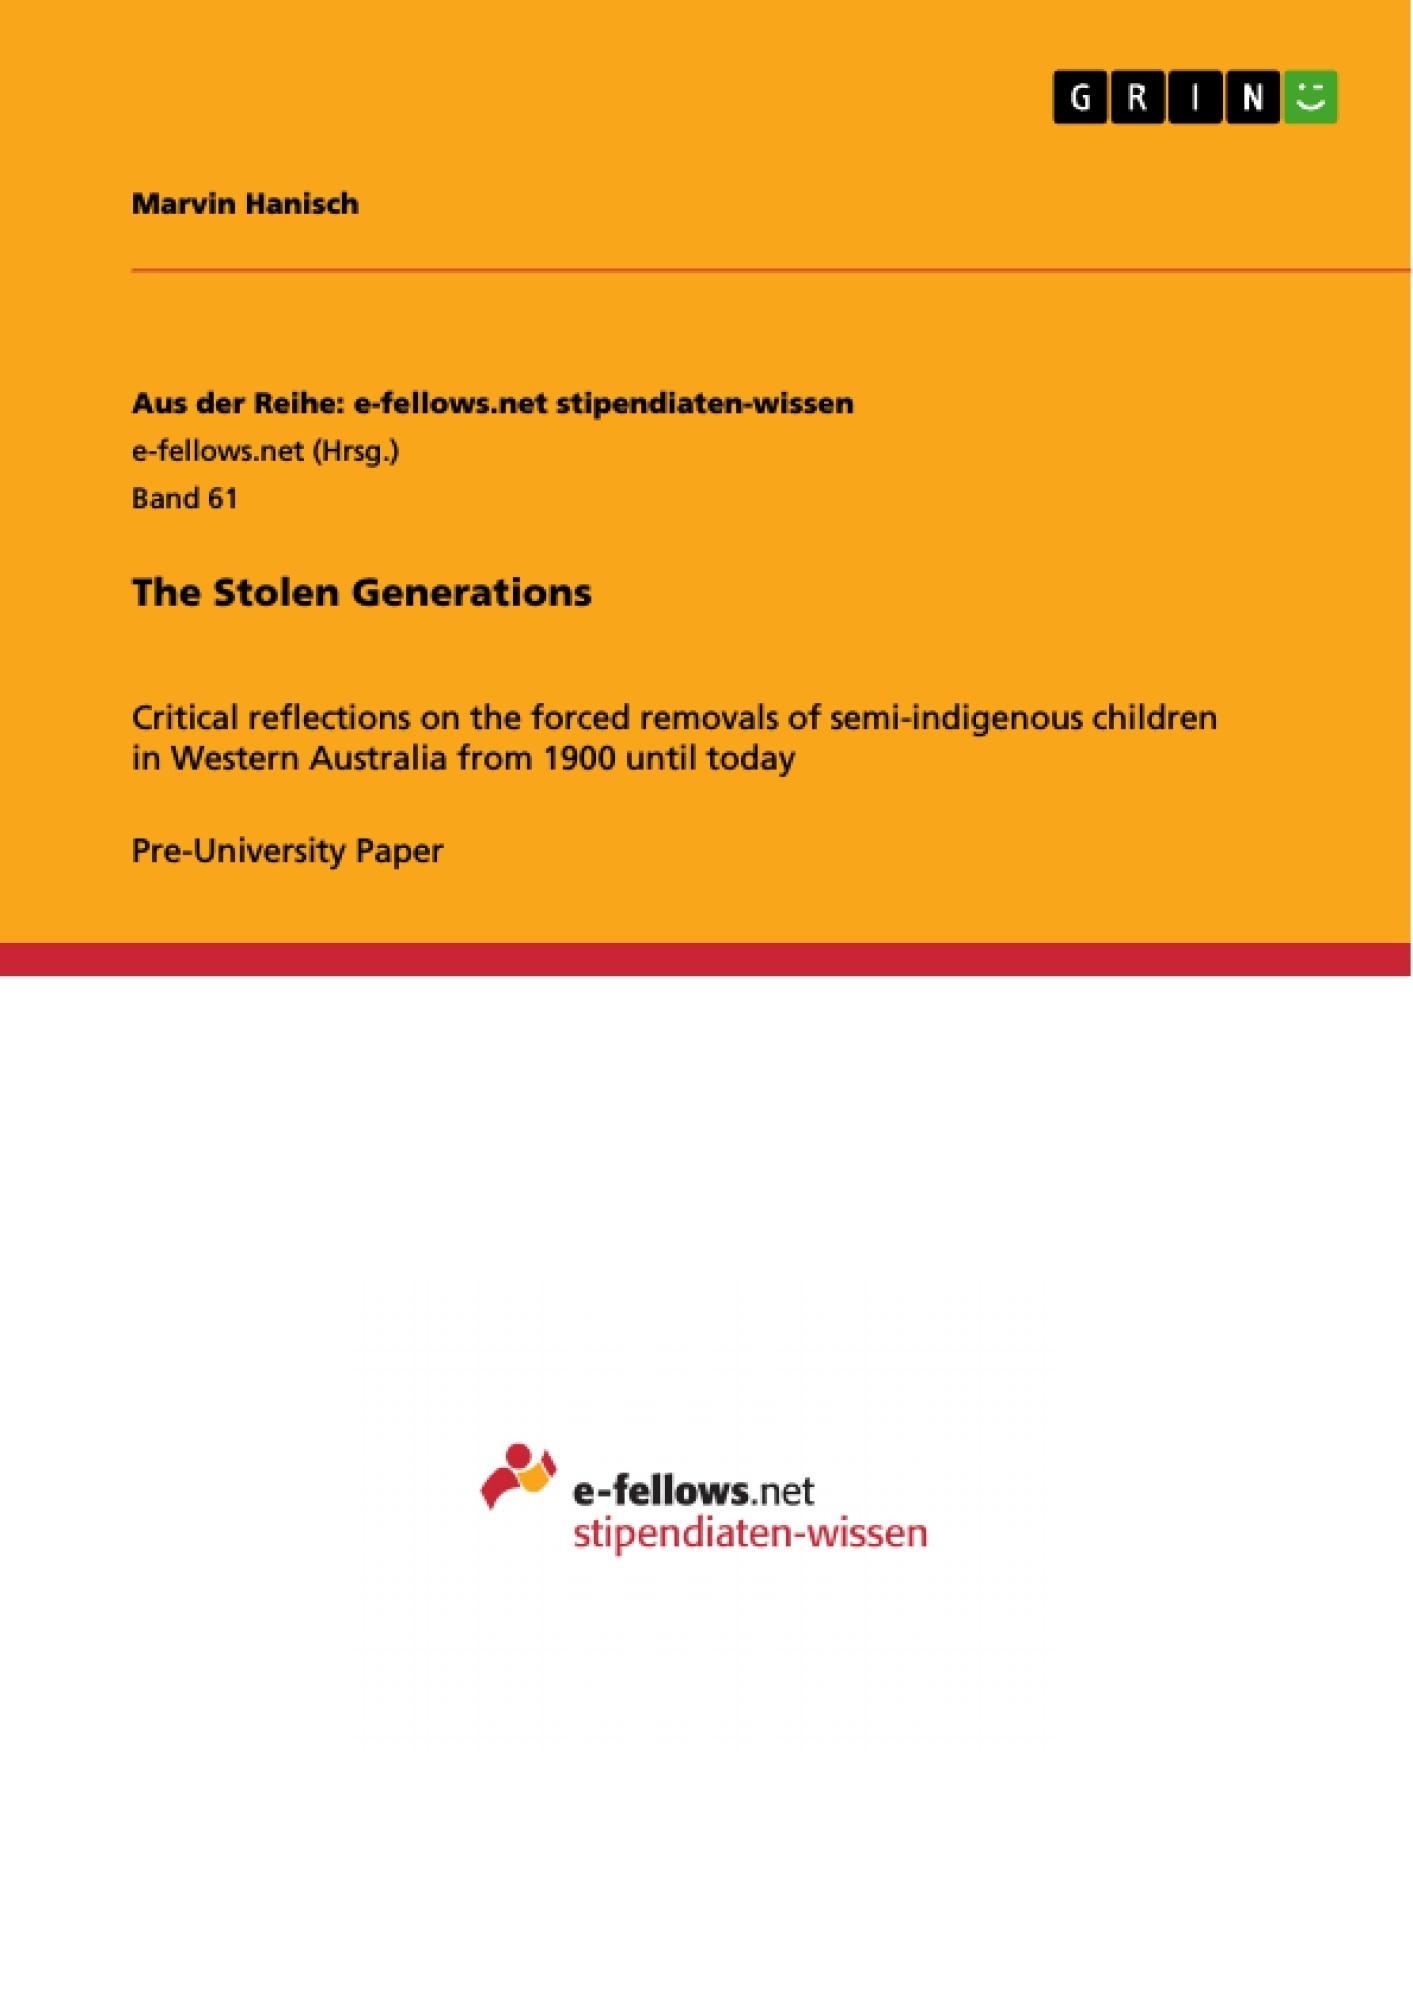 Title: The Stolen Generations